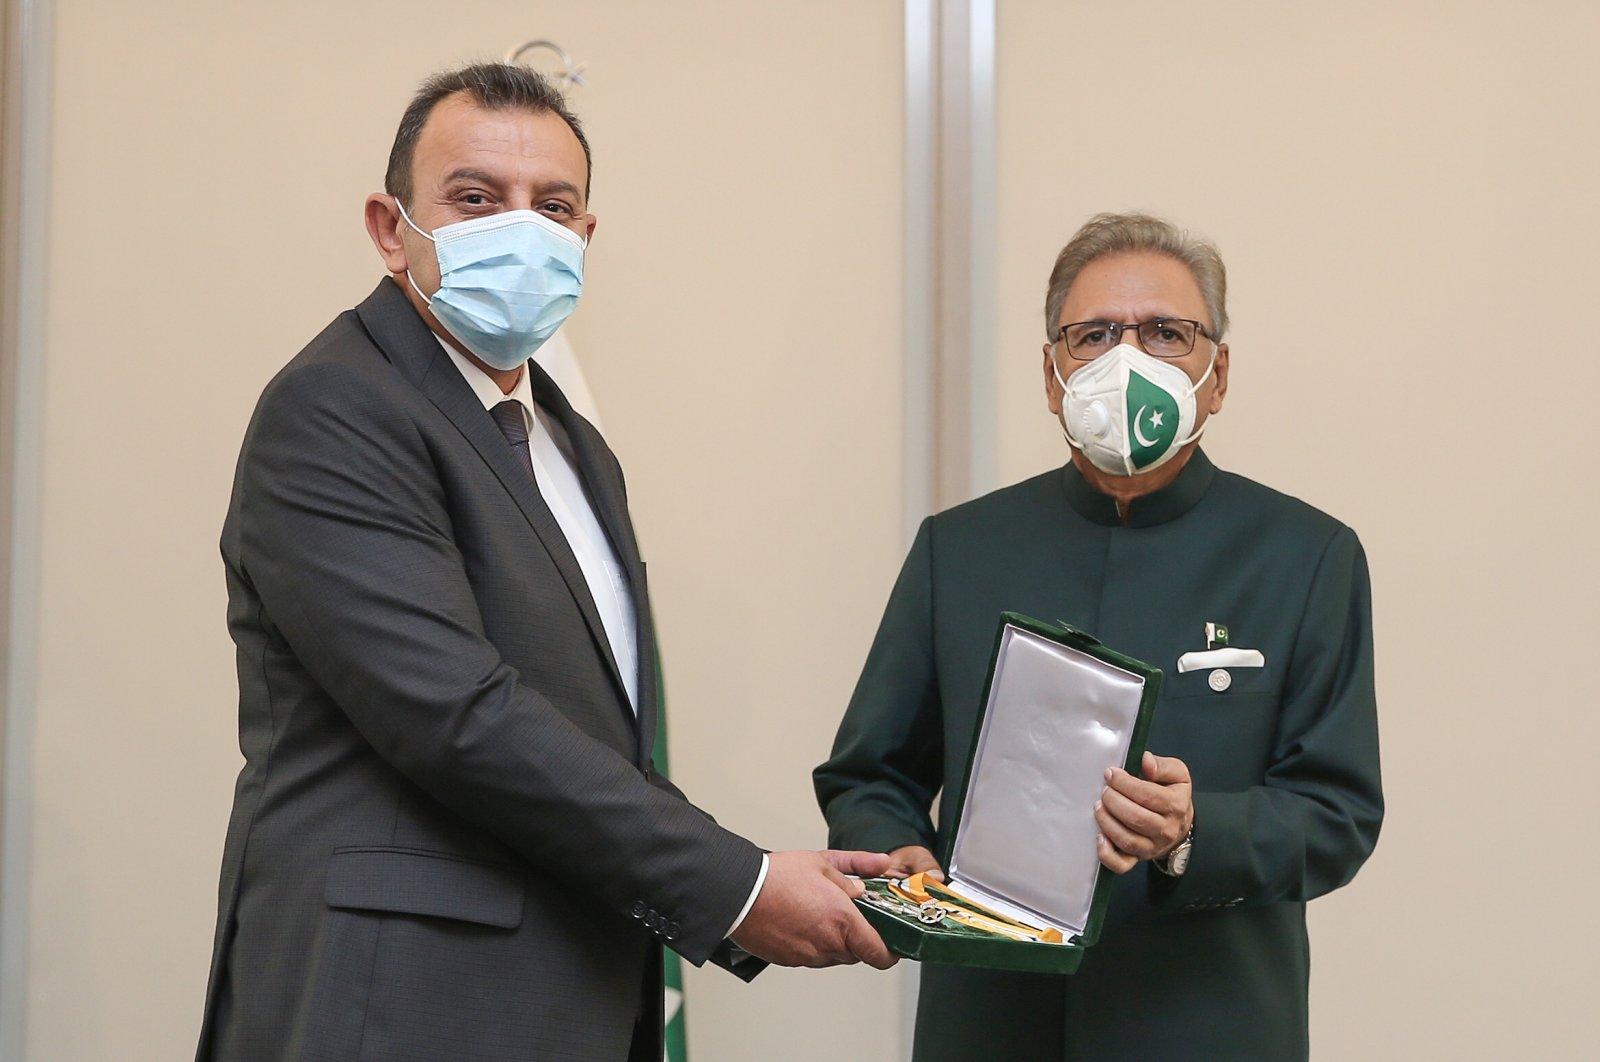 Dr. Selami Kılıç (L) receives his award from Pakistani President Arif Alvi, in Istanbul, Turkey, Aug. 15, 2021. (AA PHOTO)